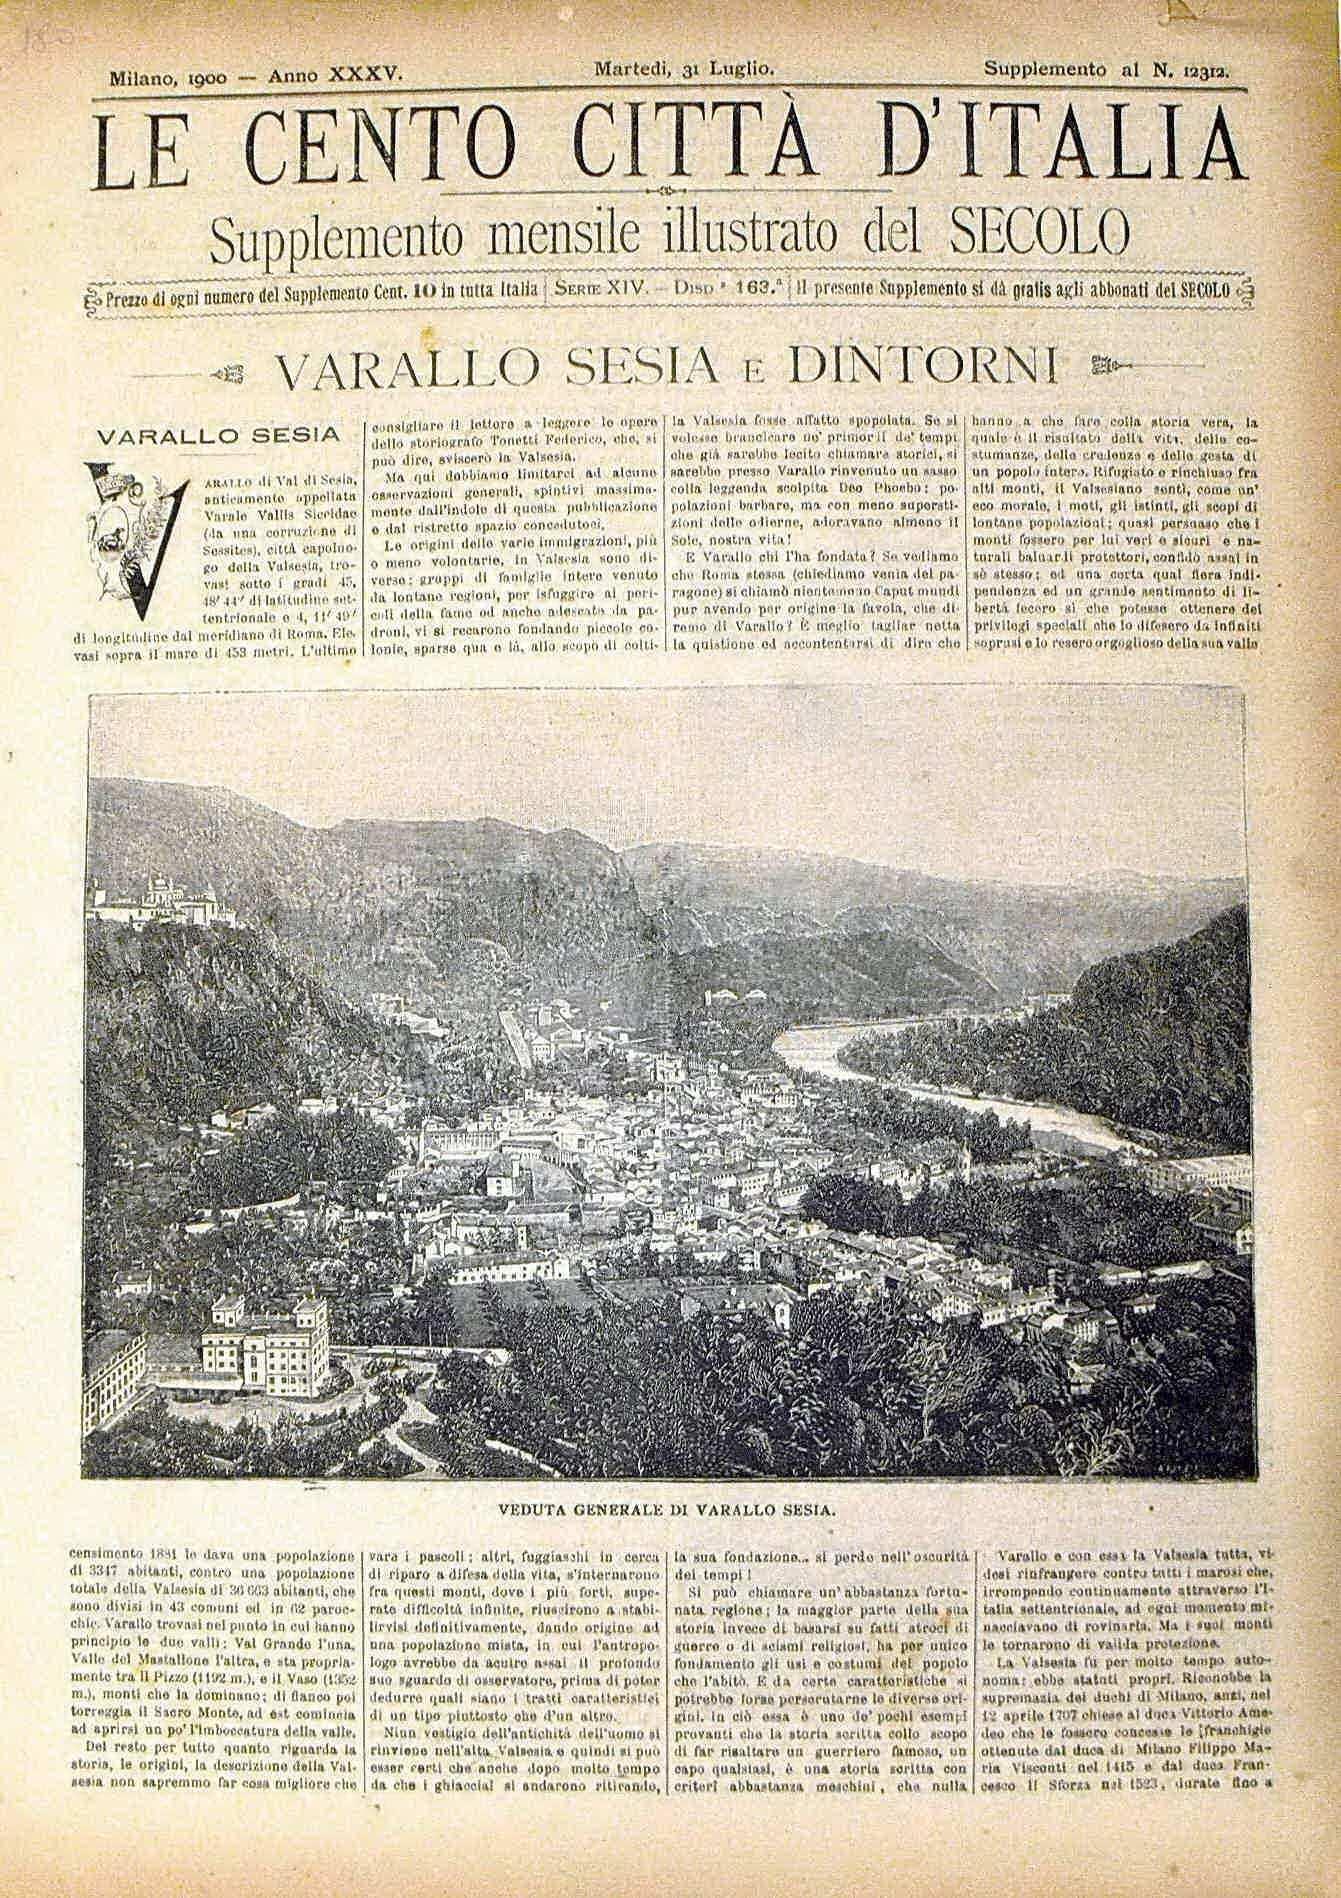 Le cento citt? d'Italia - VARALLO SESIA E DINTORNI